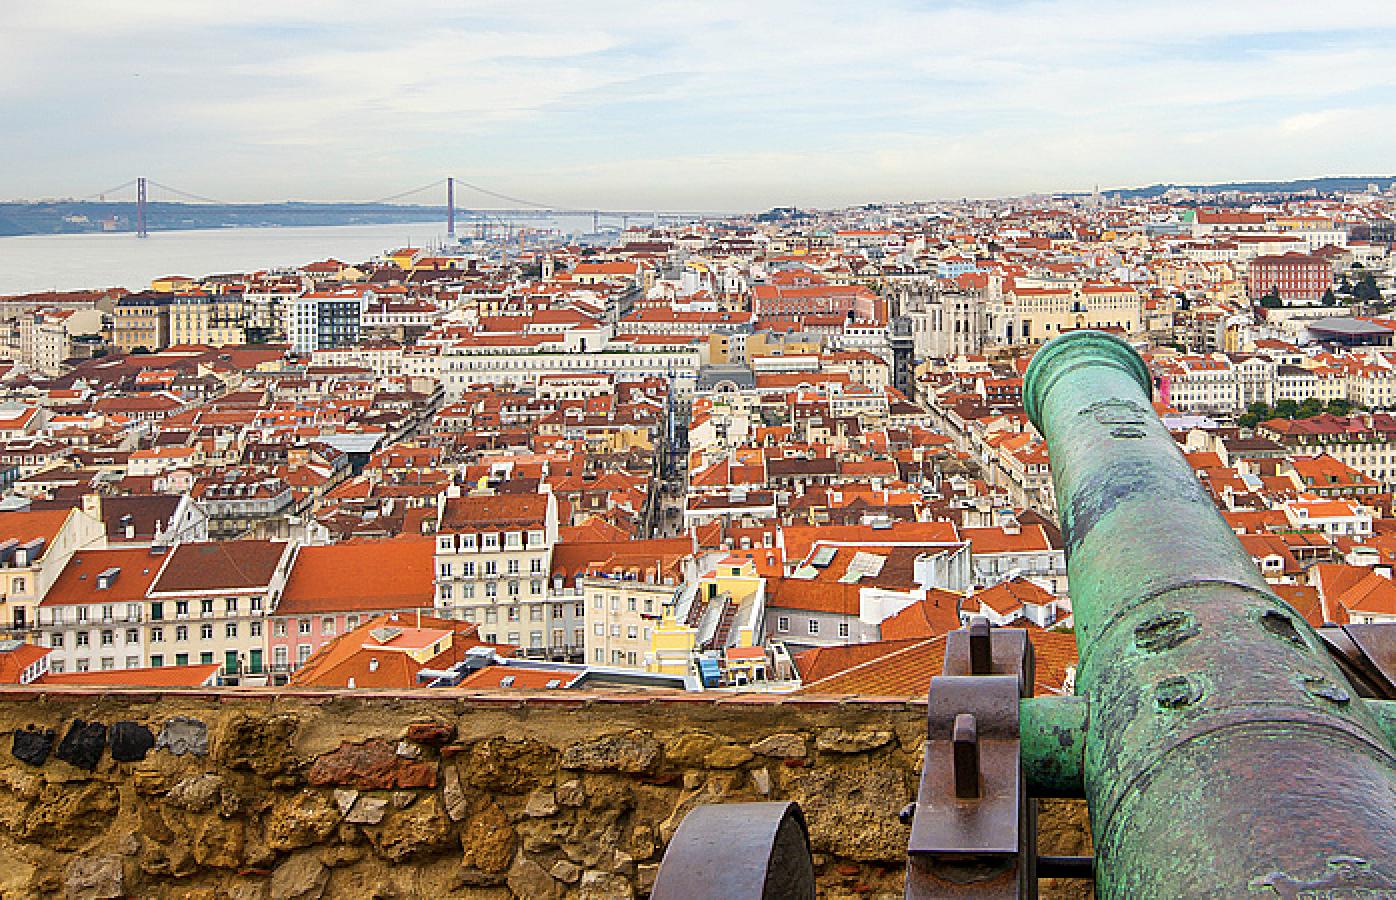 Lisboa desde o miradouro do Castelo de S. Jorge